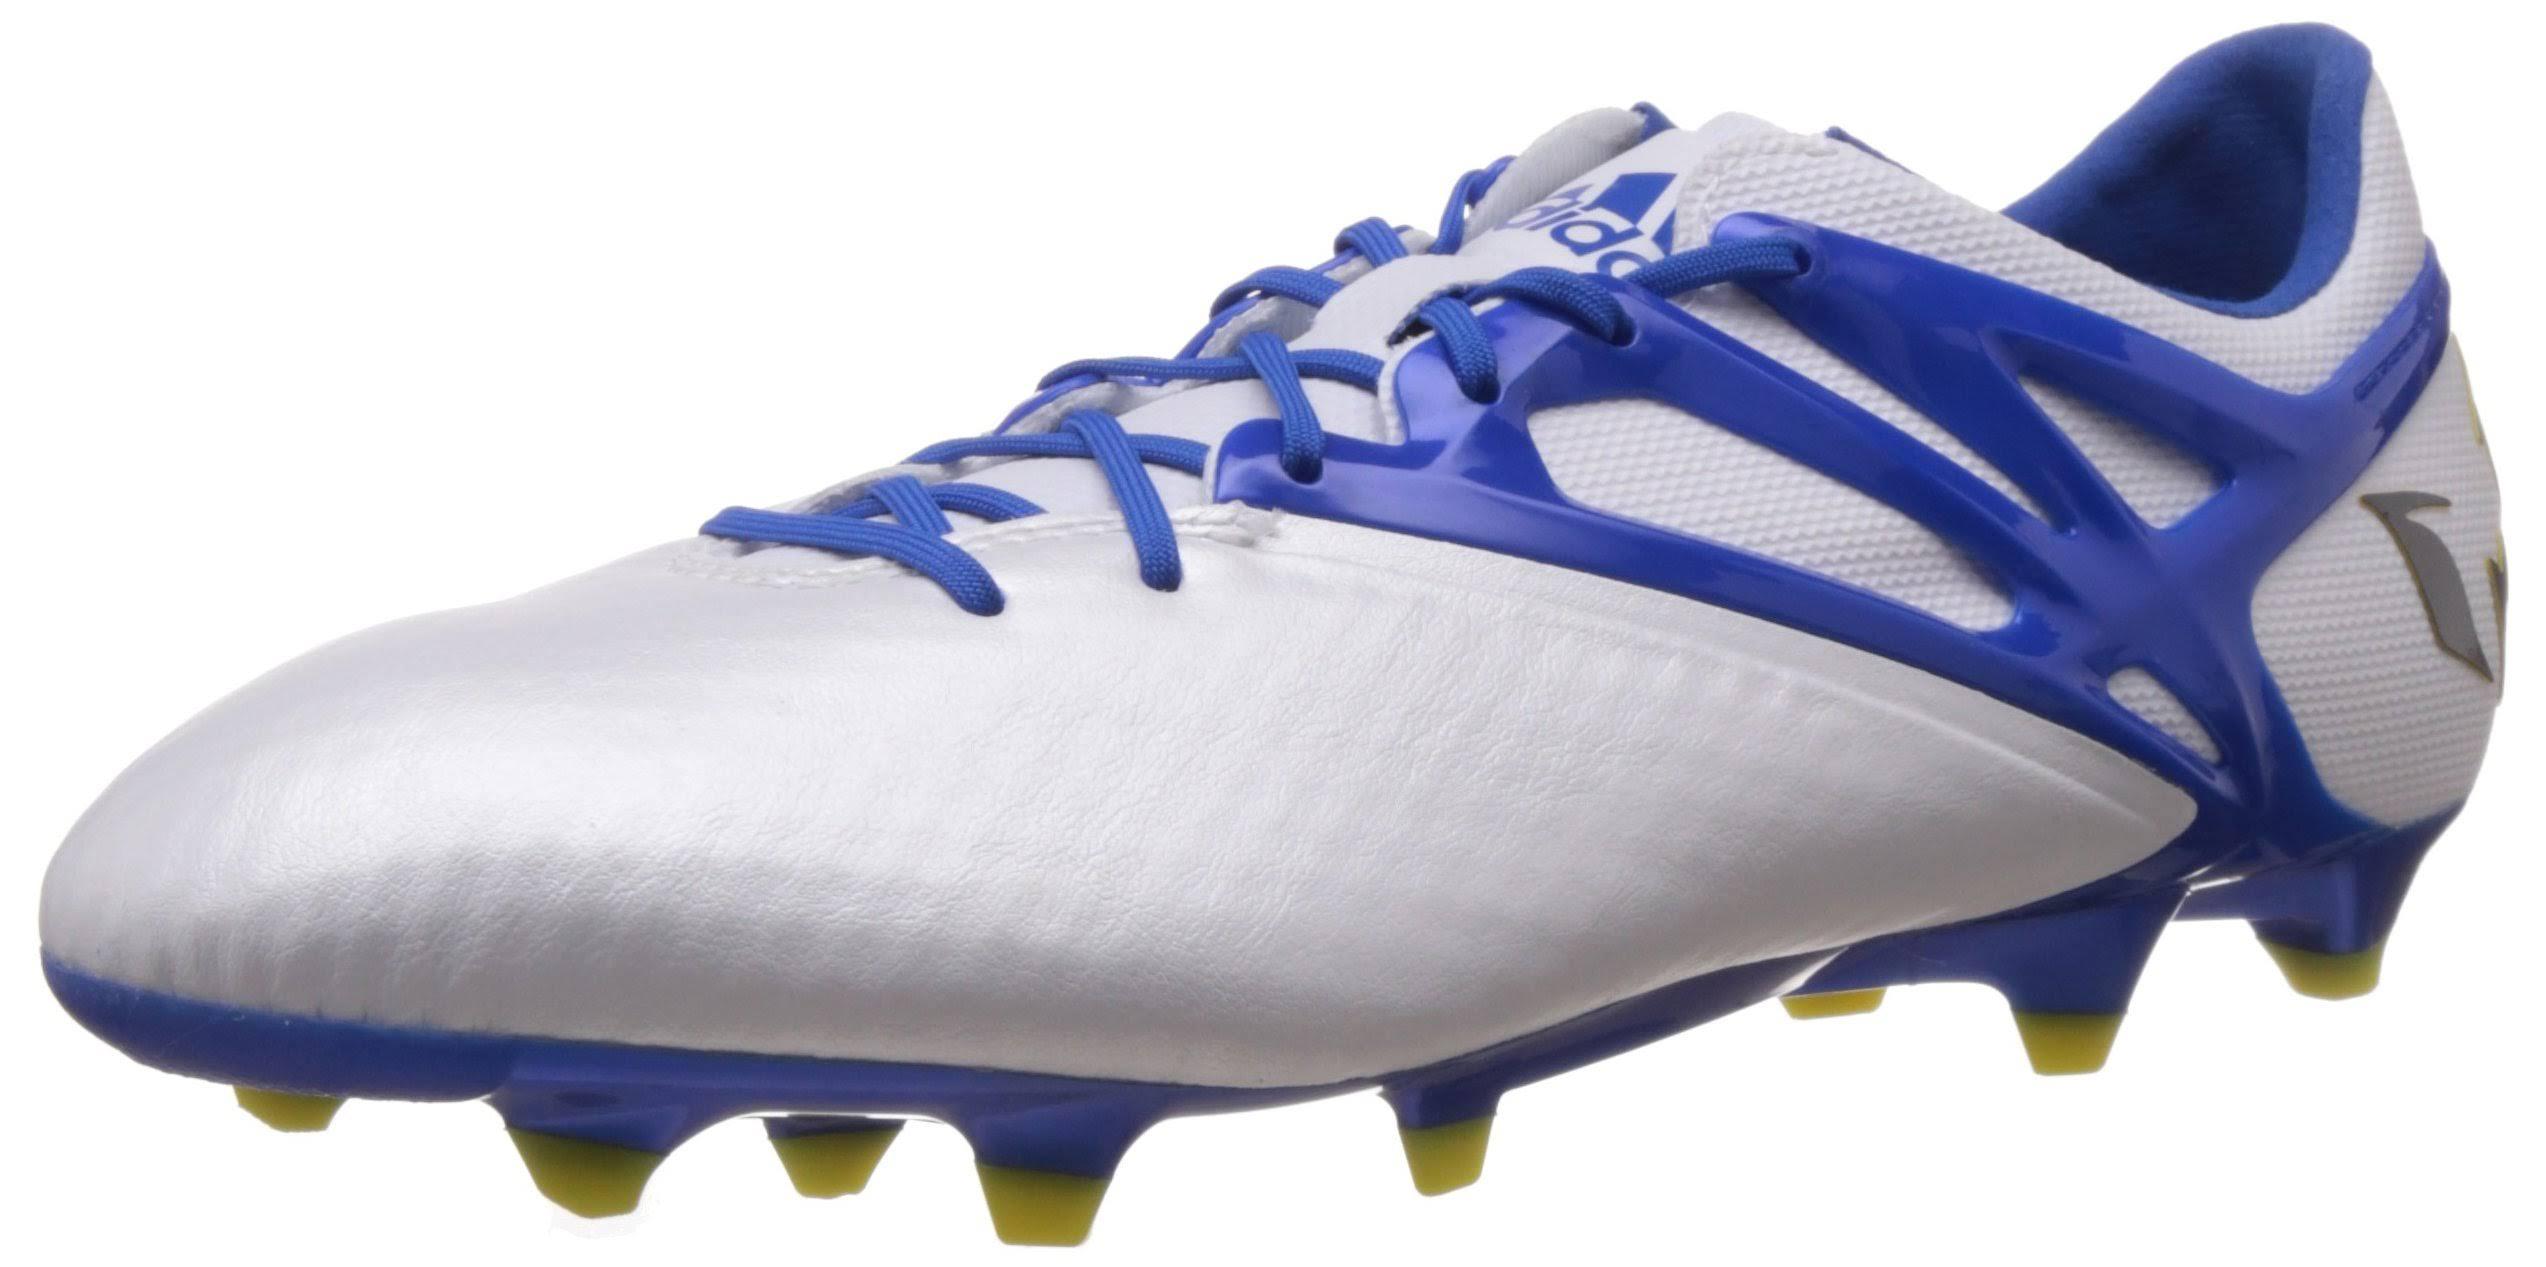 (6.5) Adidas Messi 15.1 FG/AG Mens Football Boots